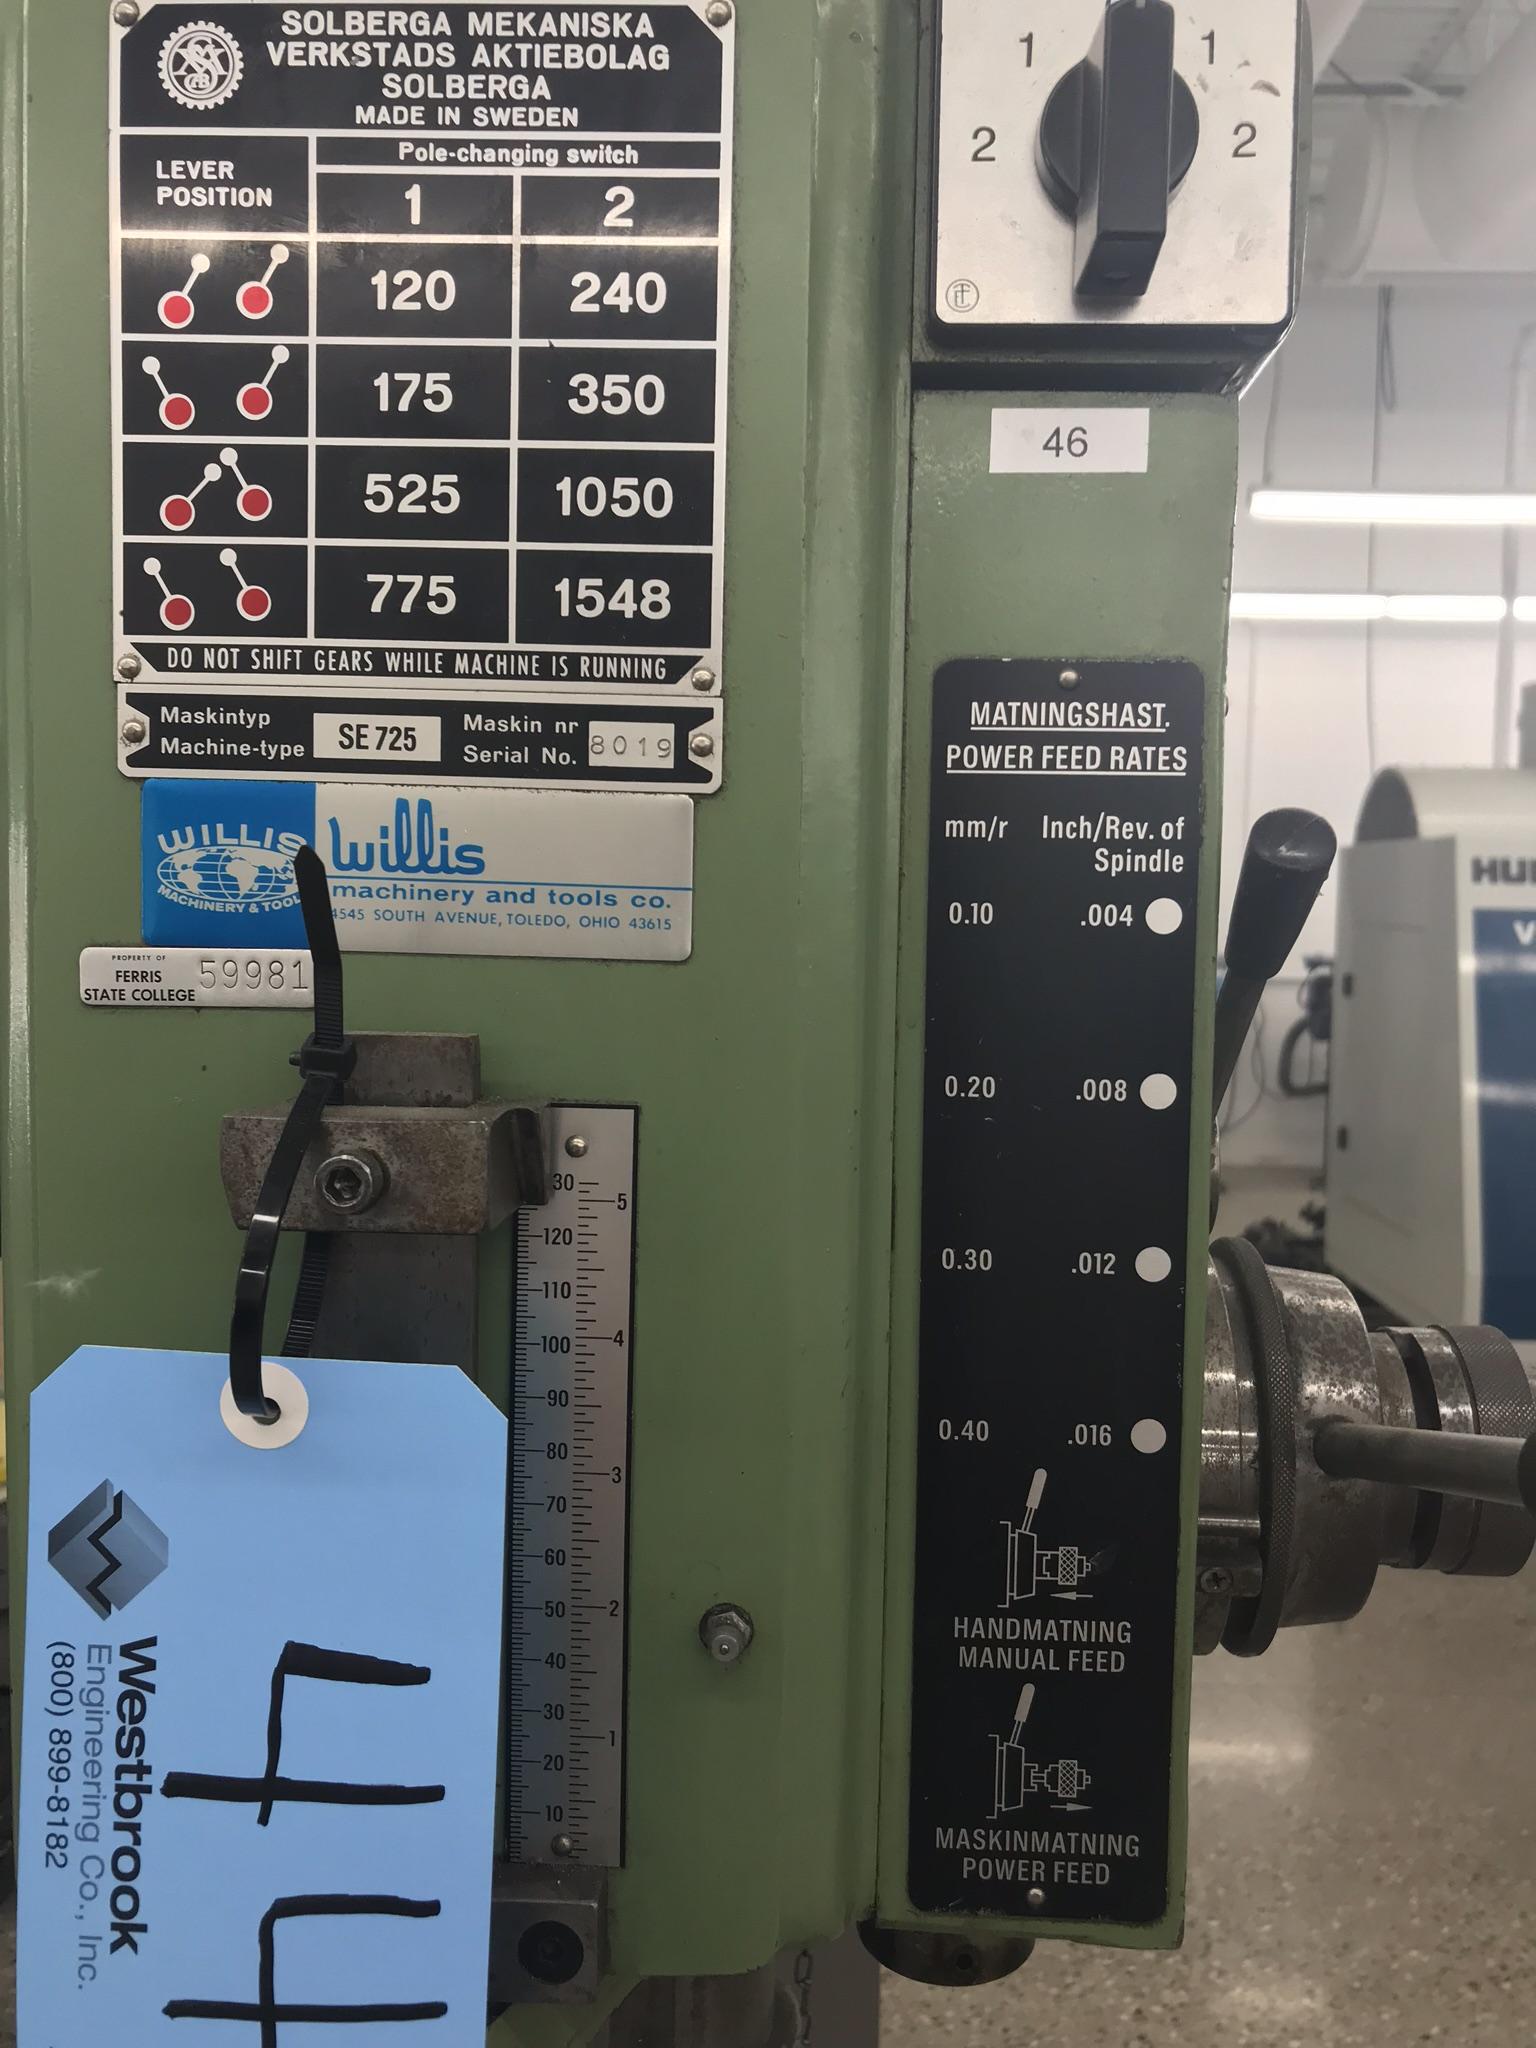 "Solberga 22""Geared Head Drill Press Model # SE 725, Serial # 8019. - Image 4 of 4"